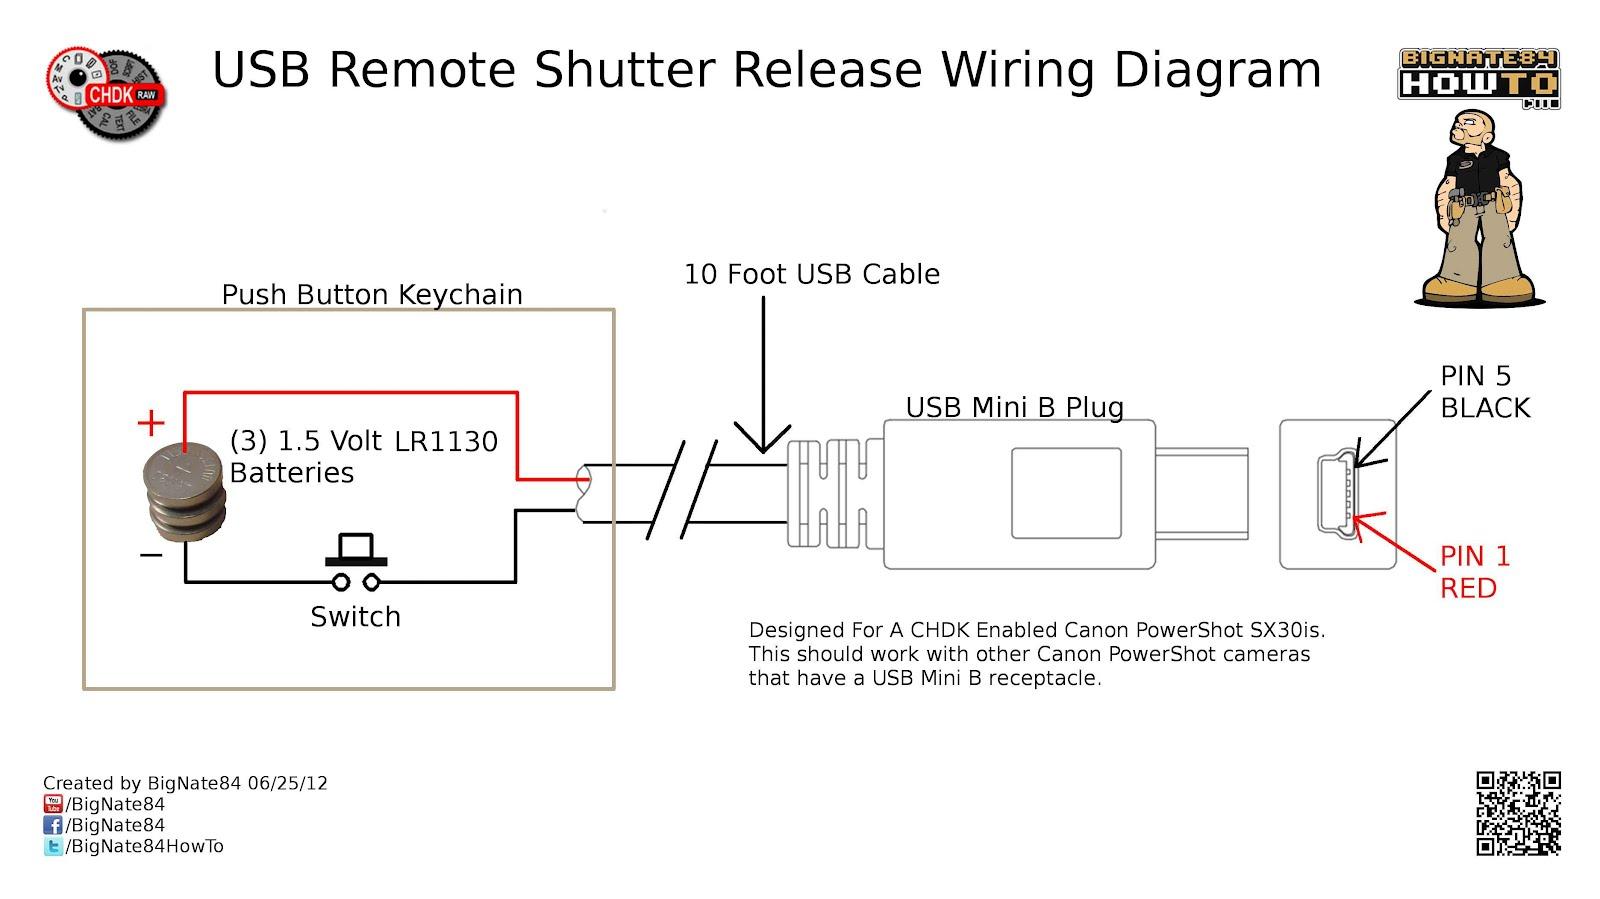 4 wire usb diagram wiring diagram rh blaknwyt co usb to 9 pin serial wiring diagram usb to 9 pin serial wiring diagram